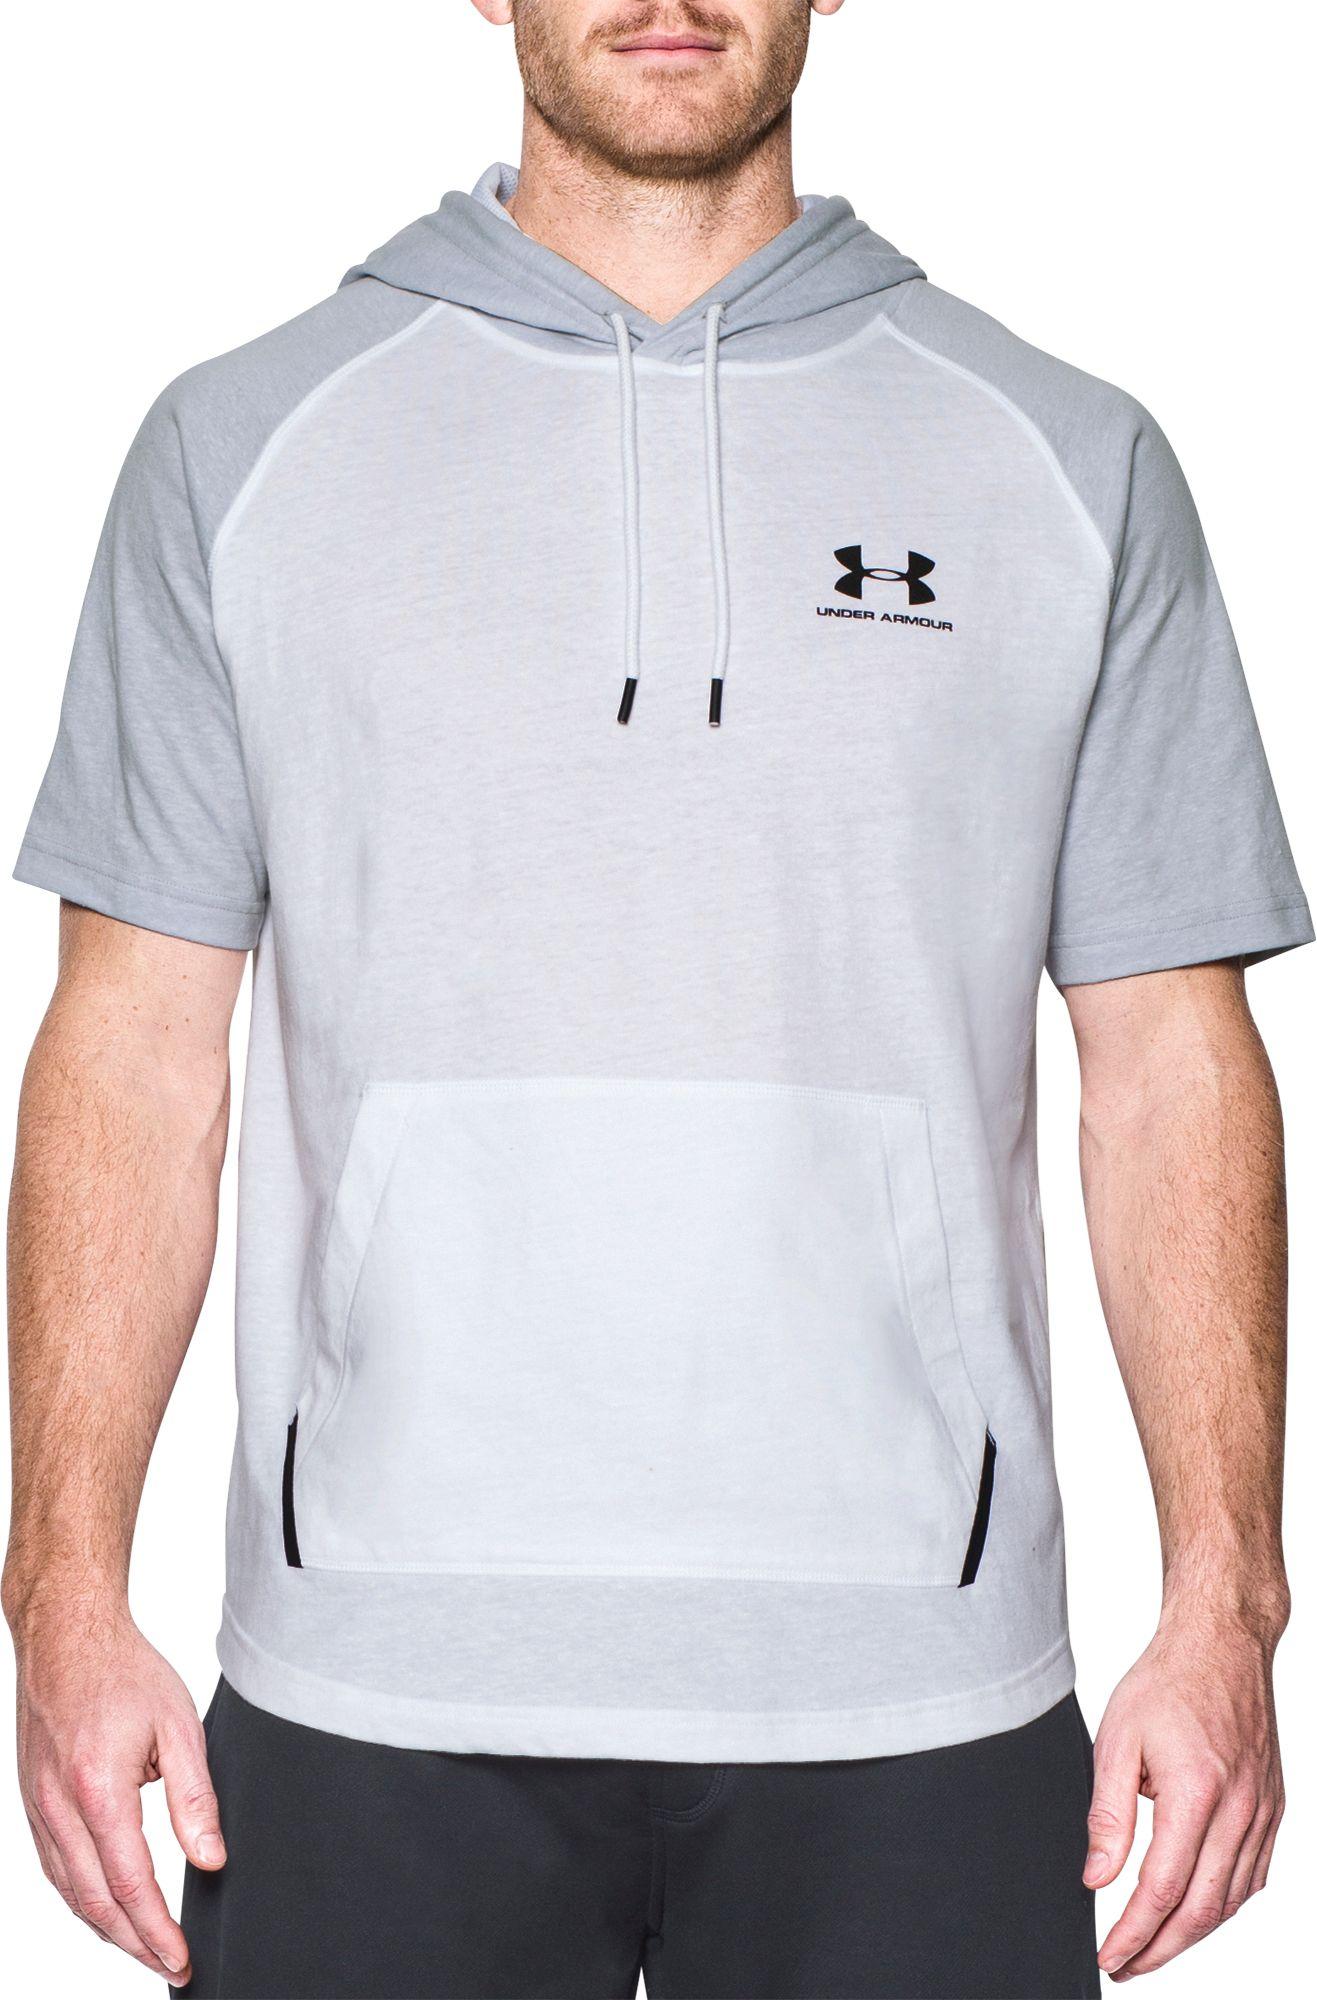 Under Armour Men's Sportstyle Short Sleeve Hoodie | DICK'S ...